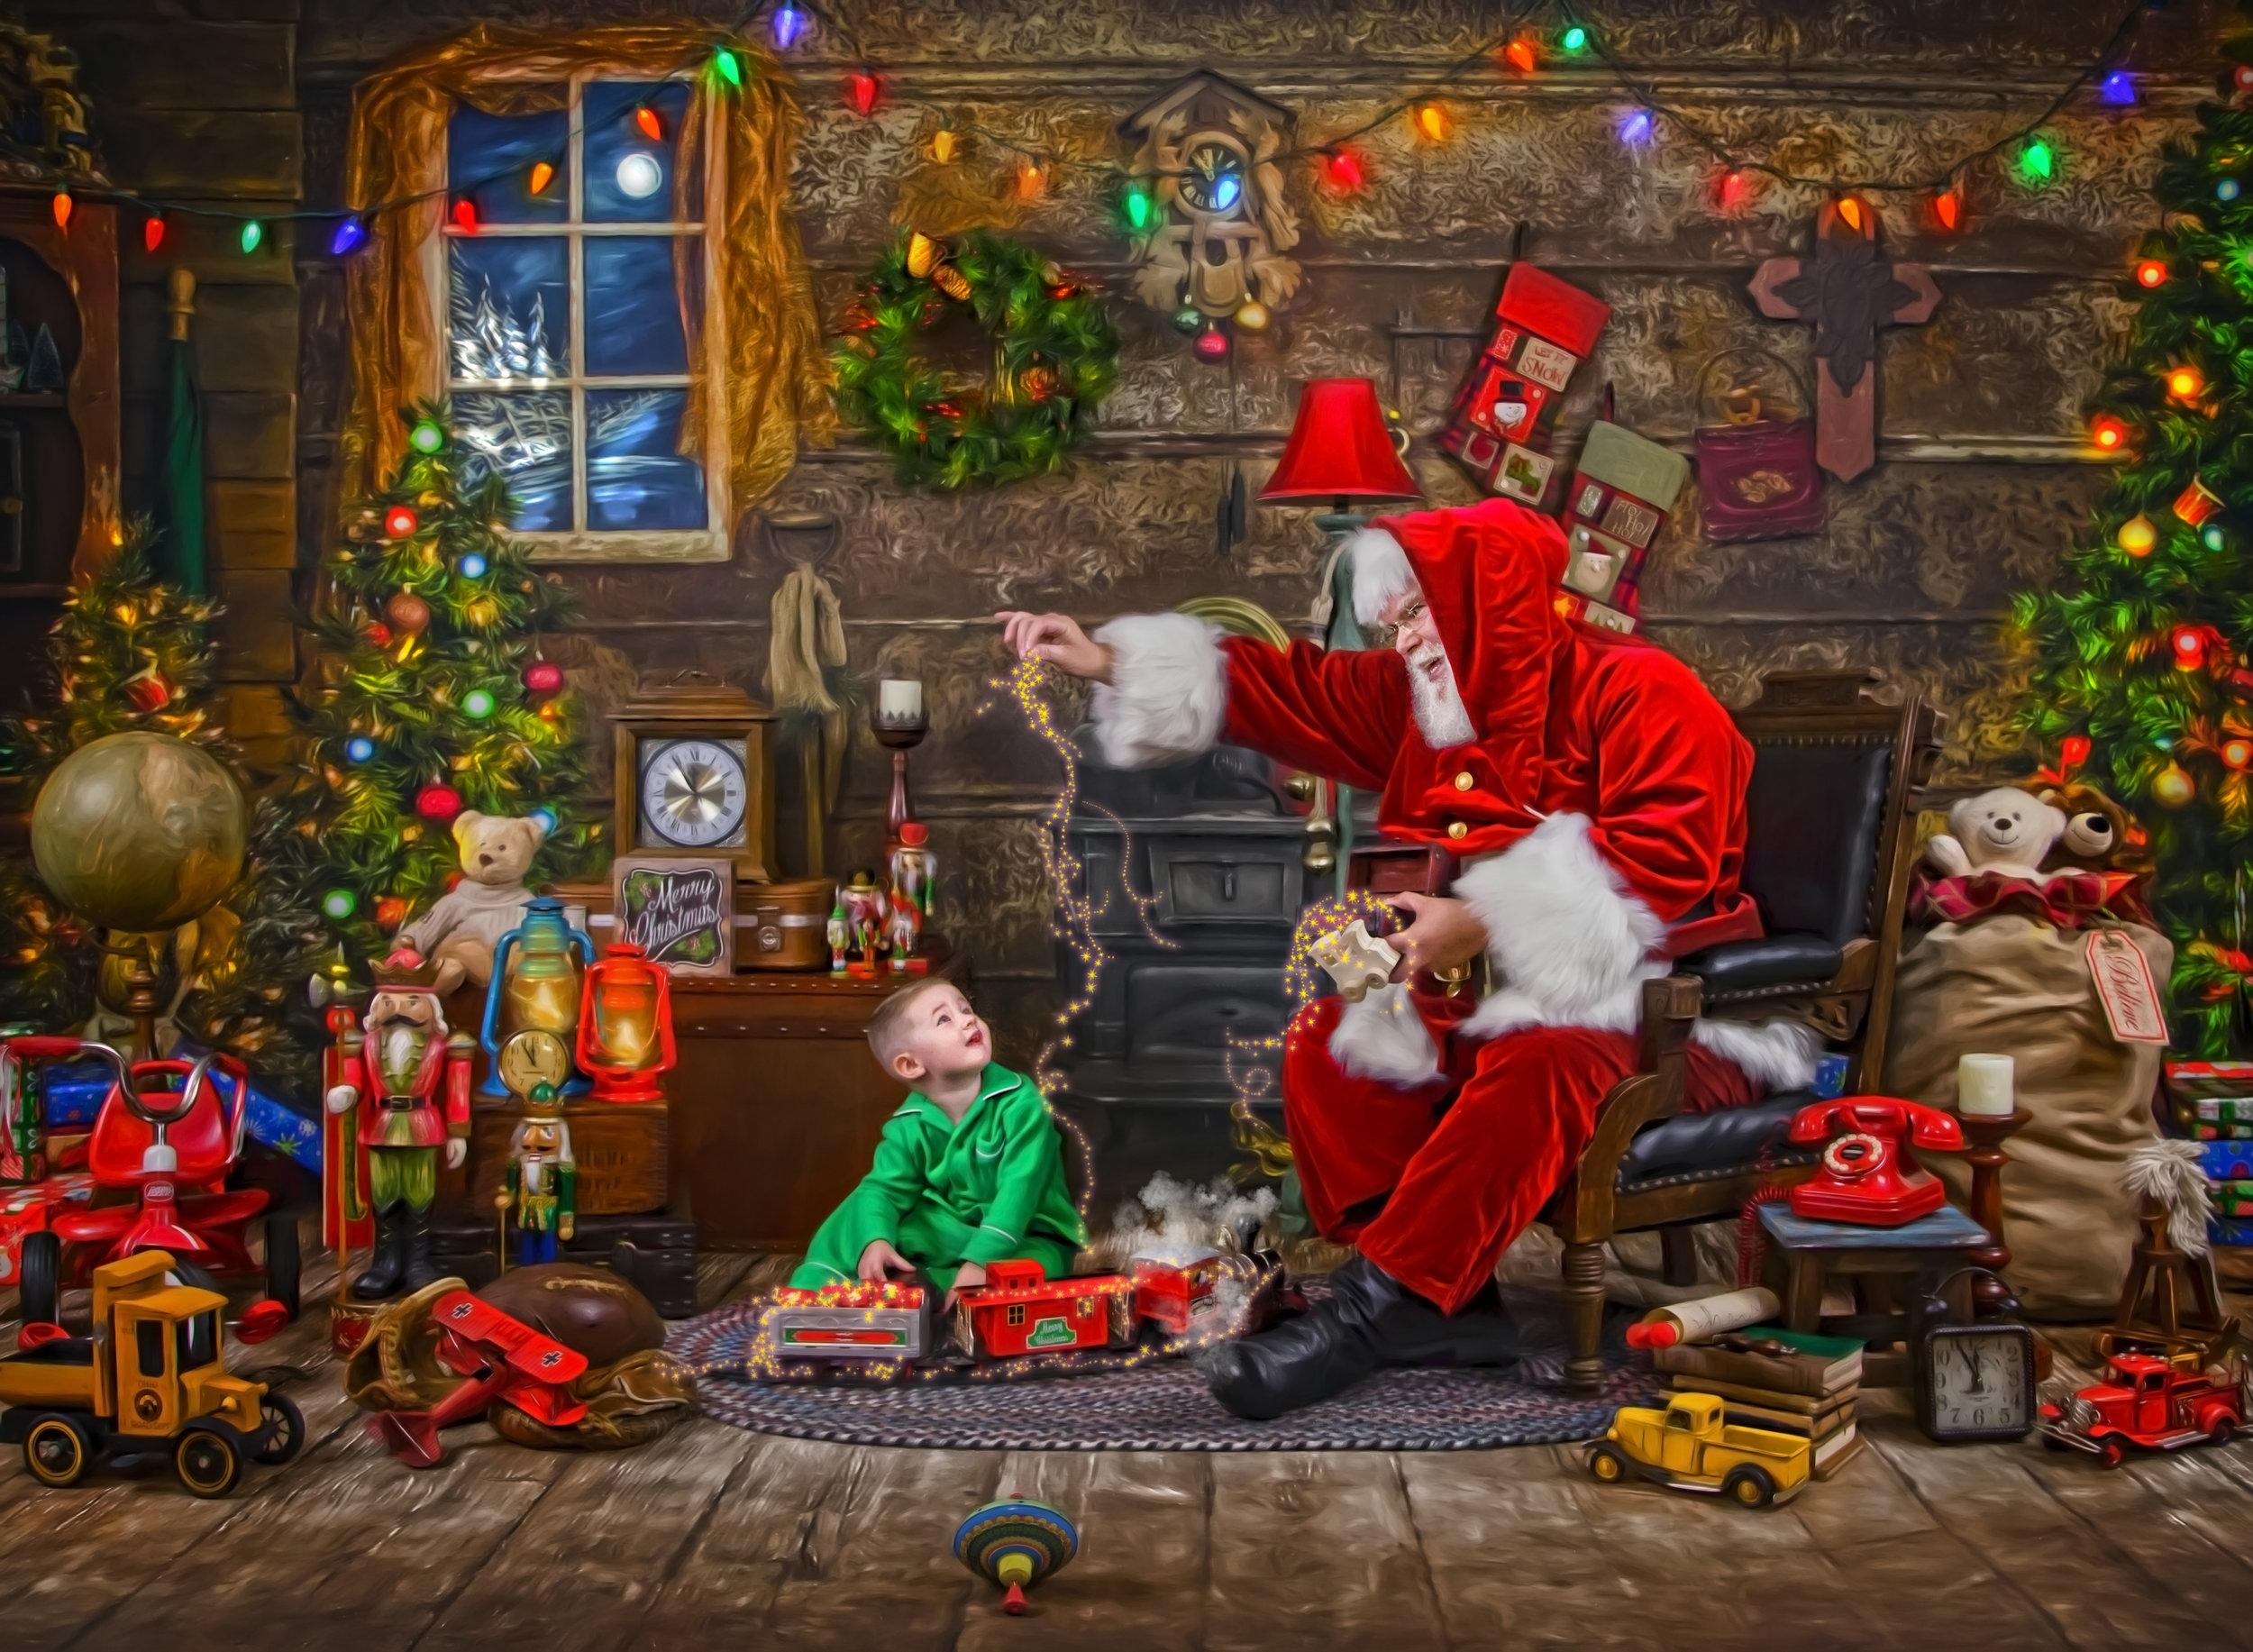 Santa's Storybook Workshop Blue Rock Ohio Santa checking his toy list